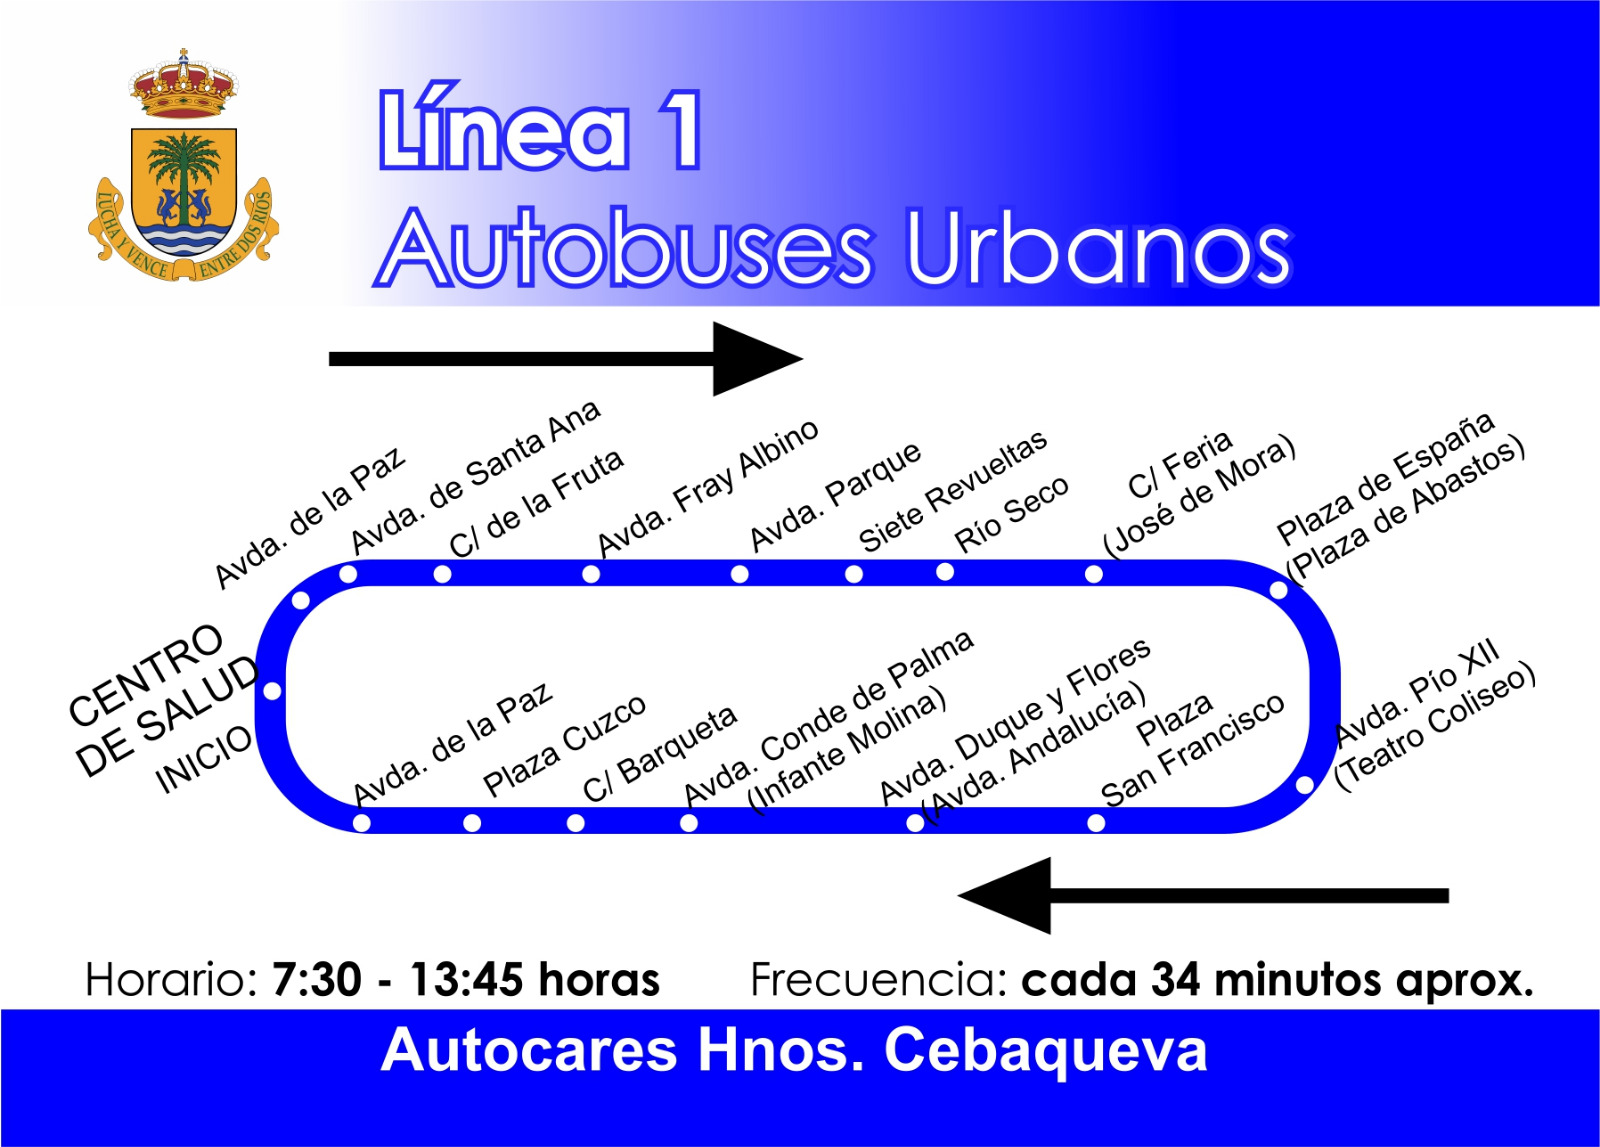 https://www.palmadelrio.es/sites/default/files/linea_1_modificado.jpg